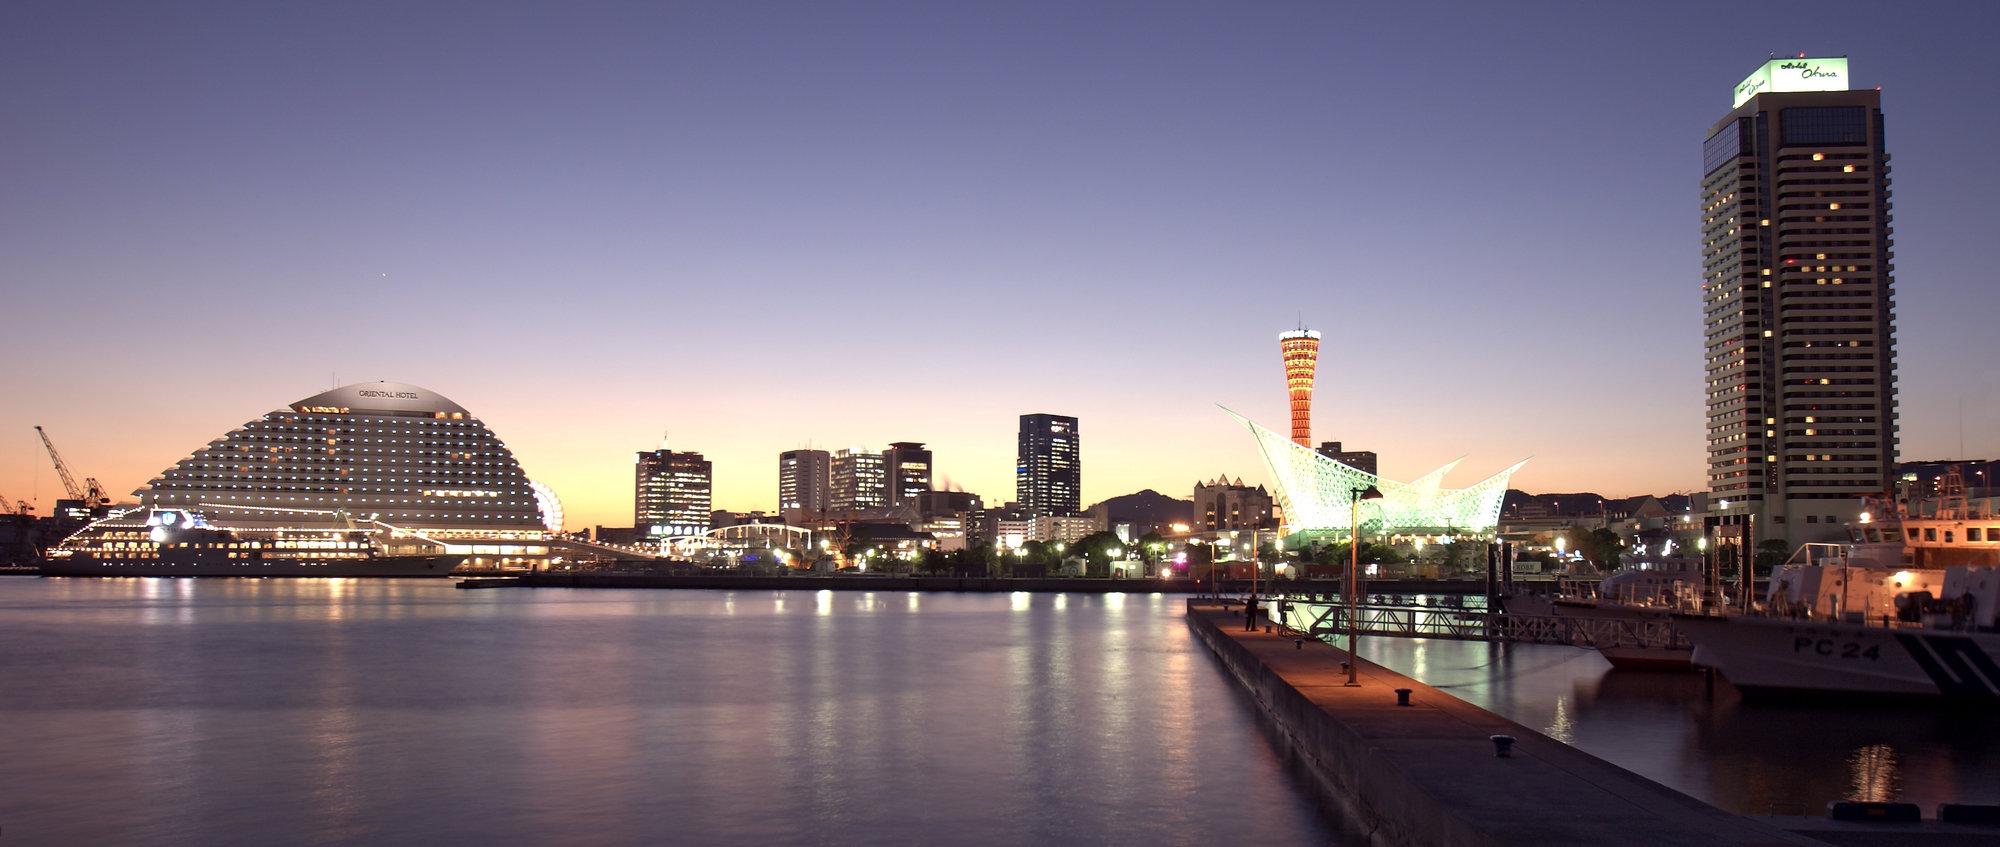 Bild13_Kobe_Stadt.jpg